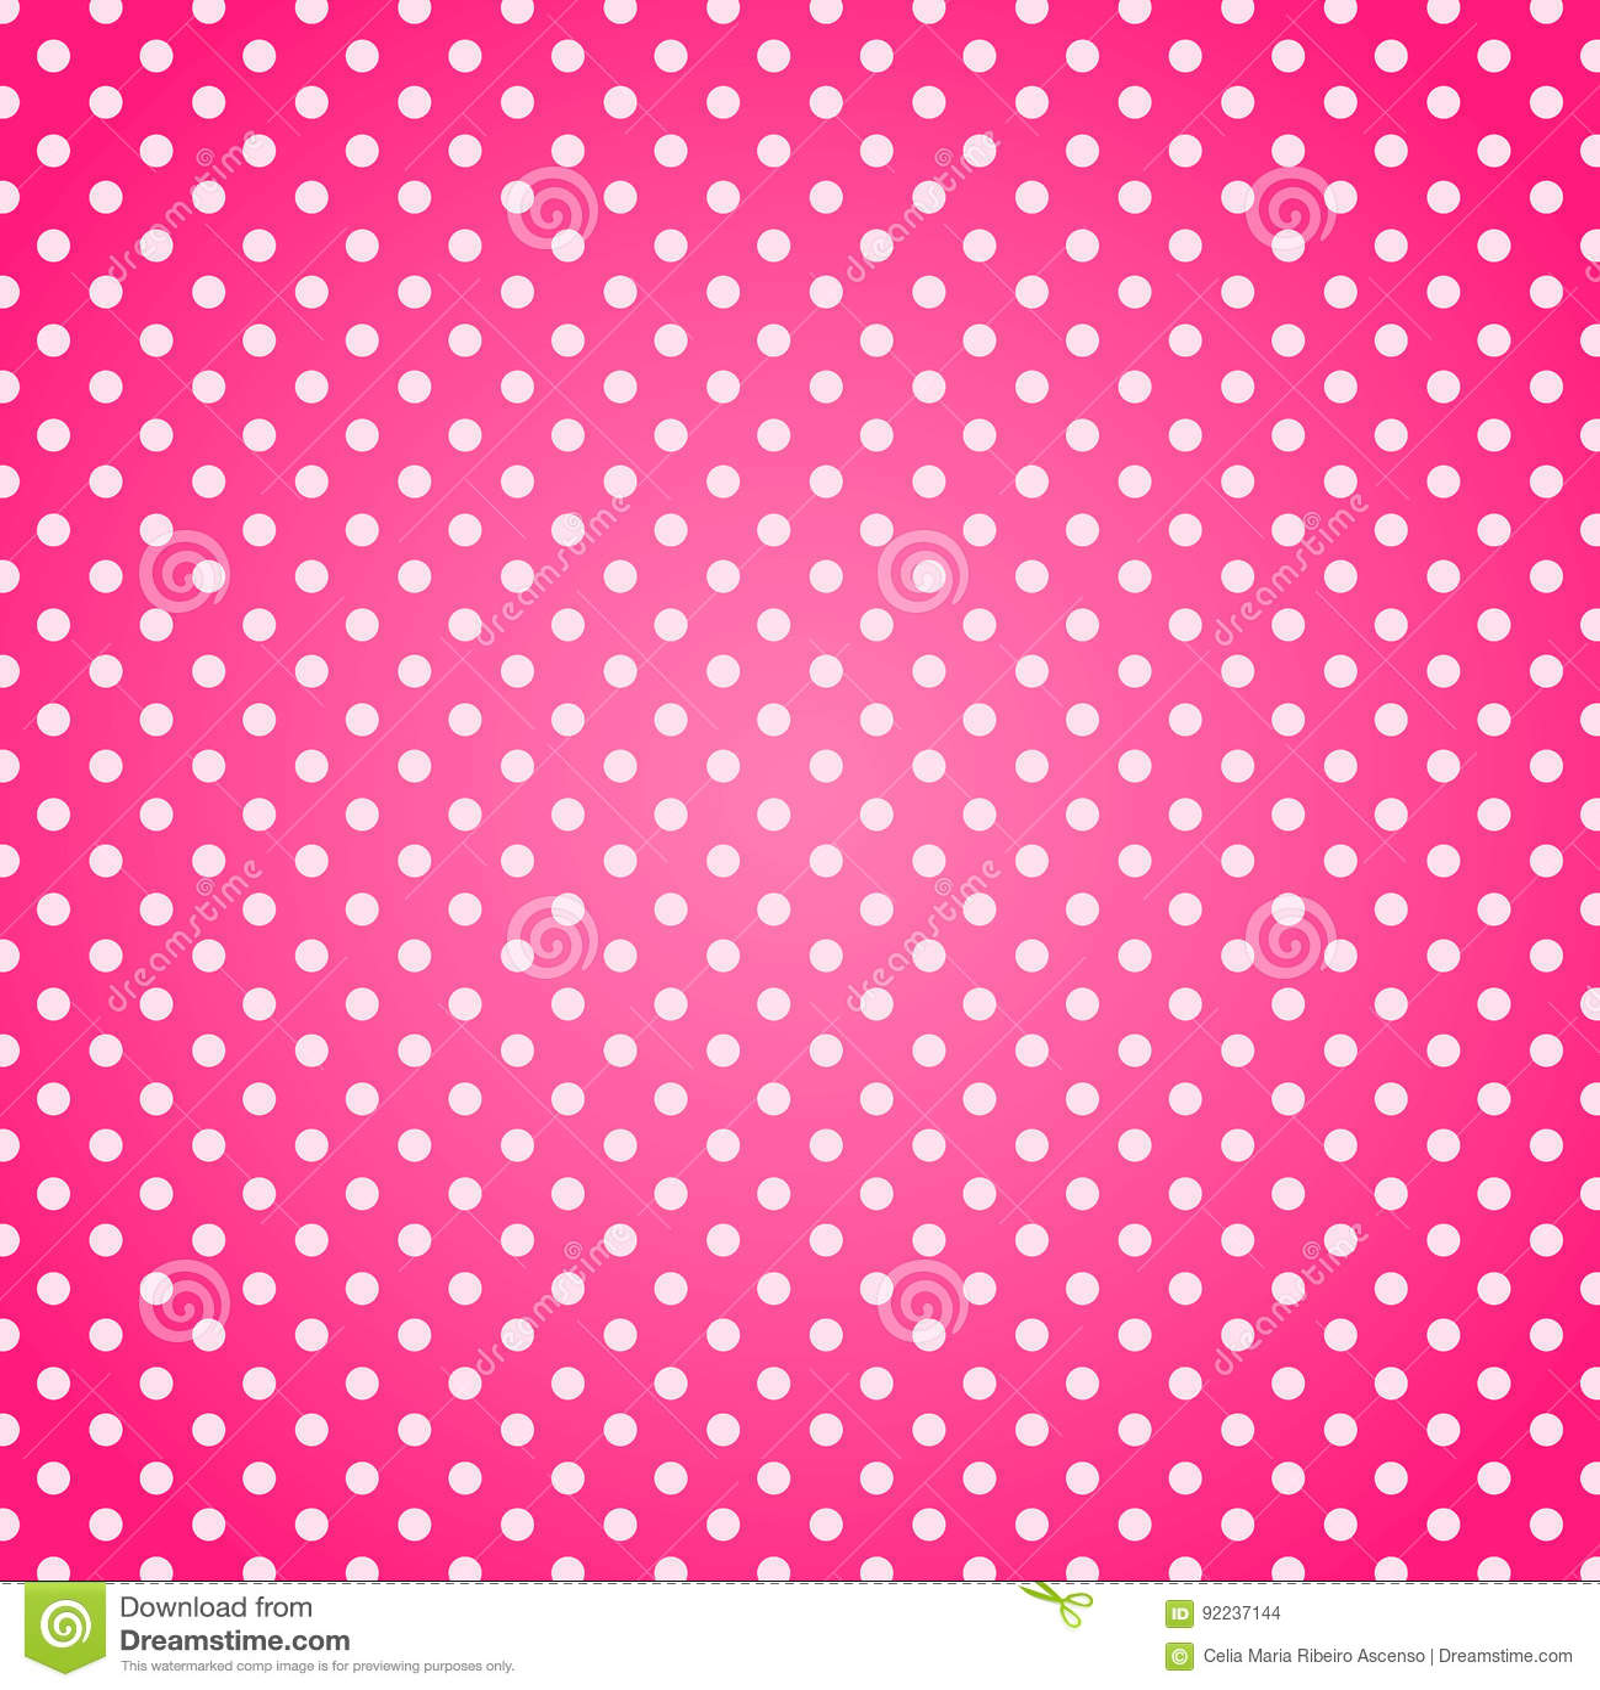 Pink polka dots background